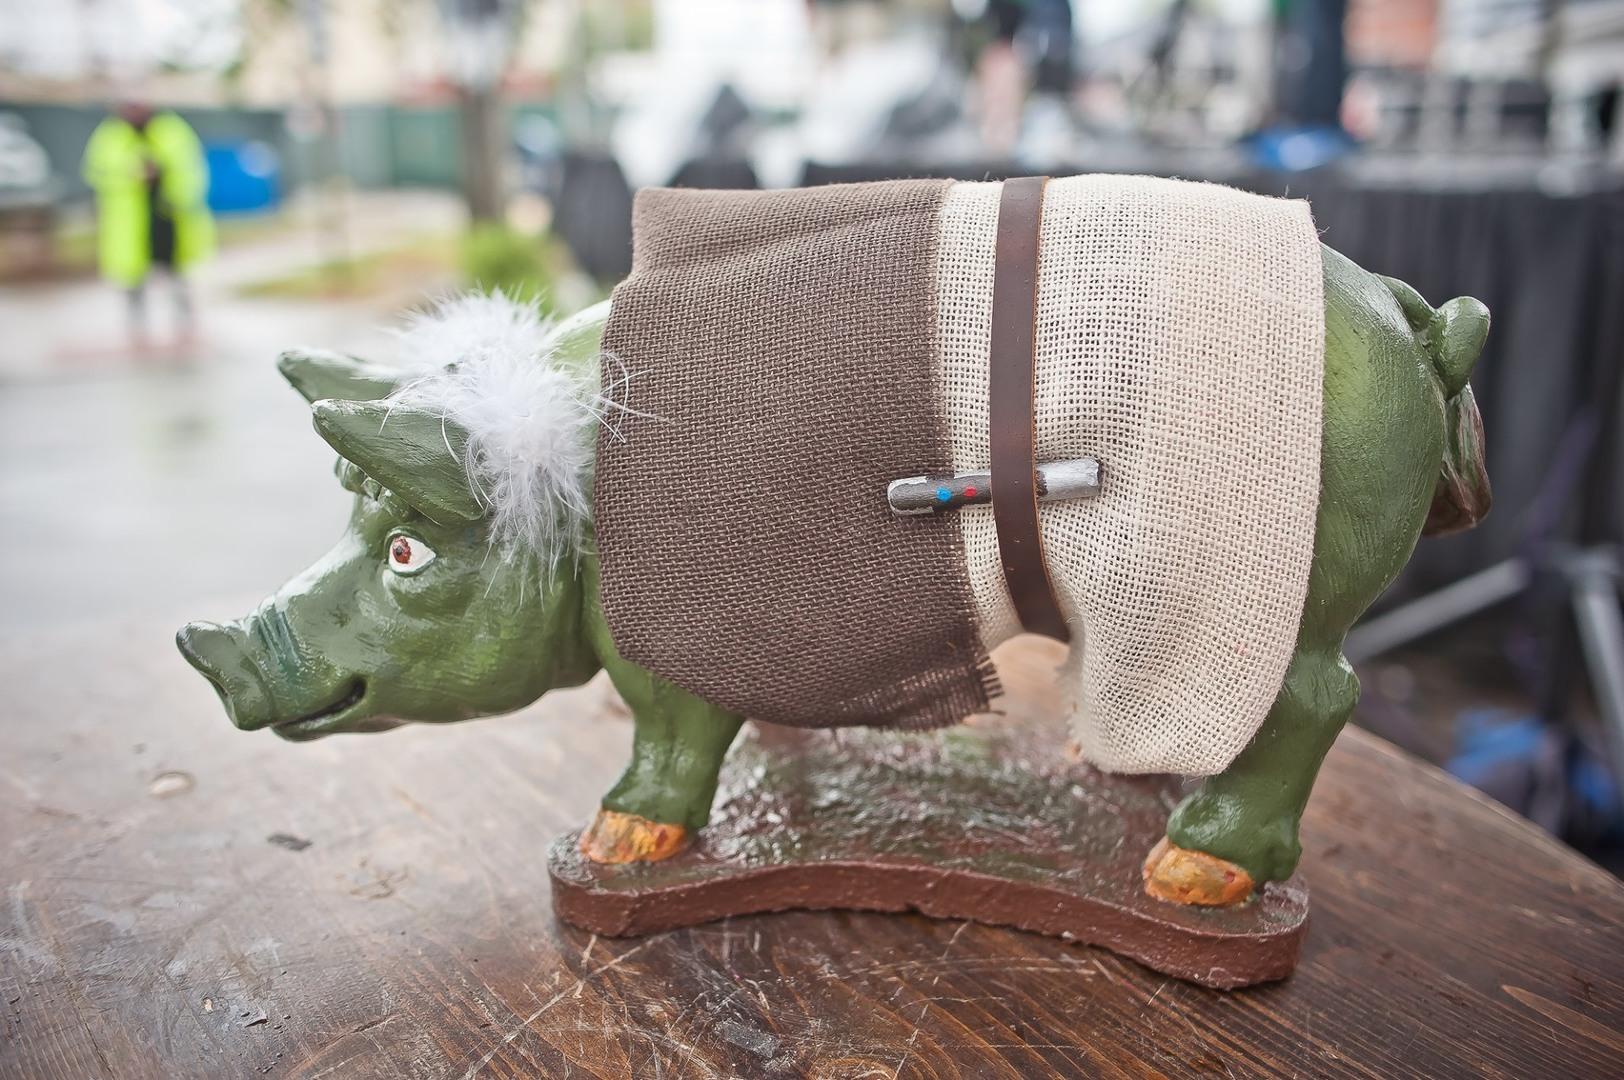 The Big Pig Project - The Big Pig Project